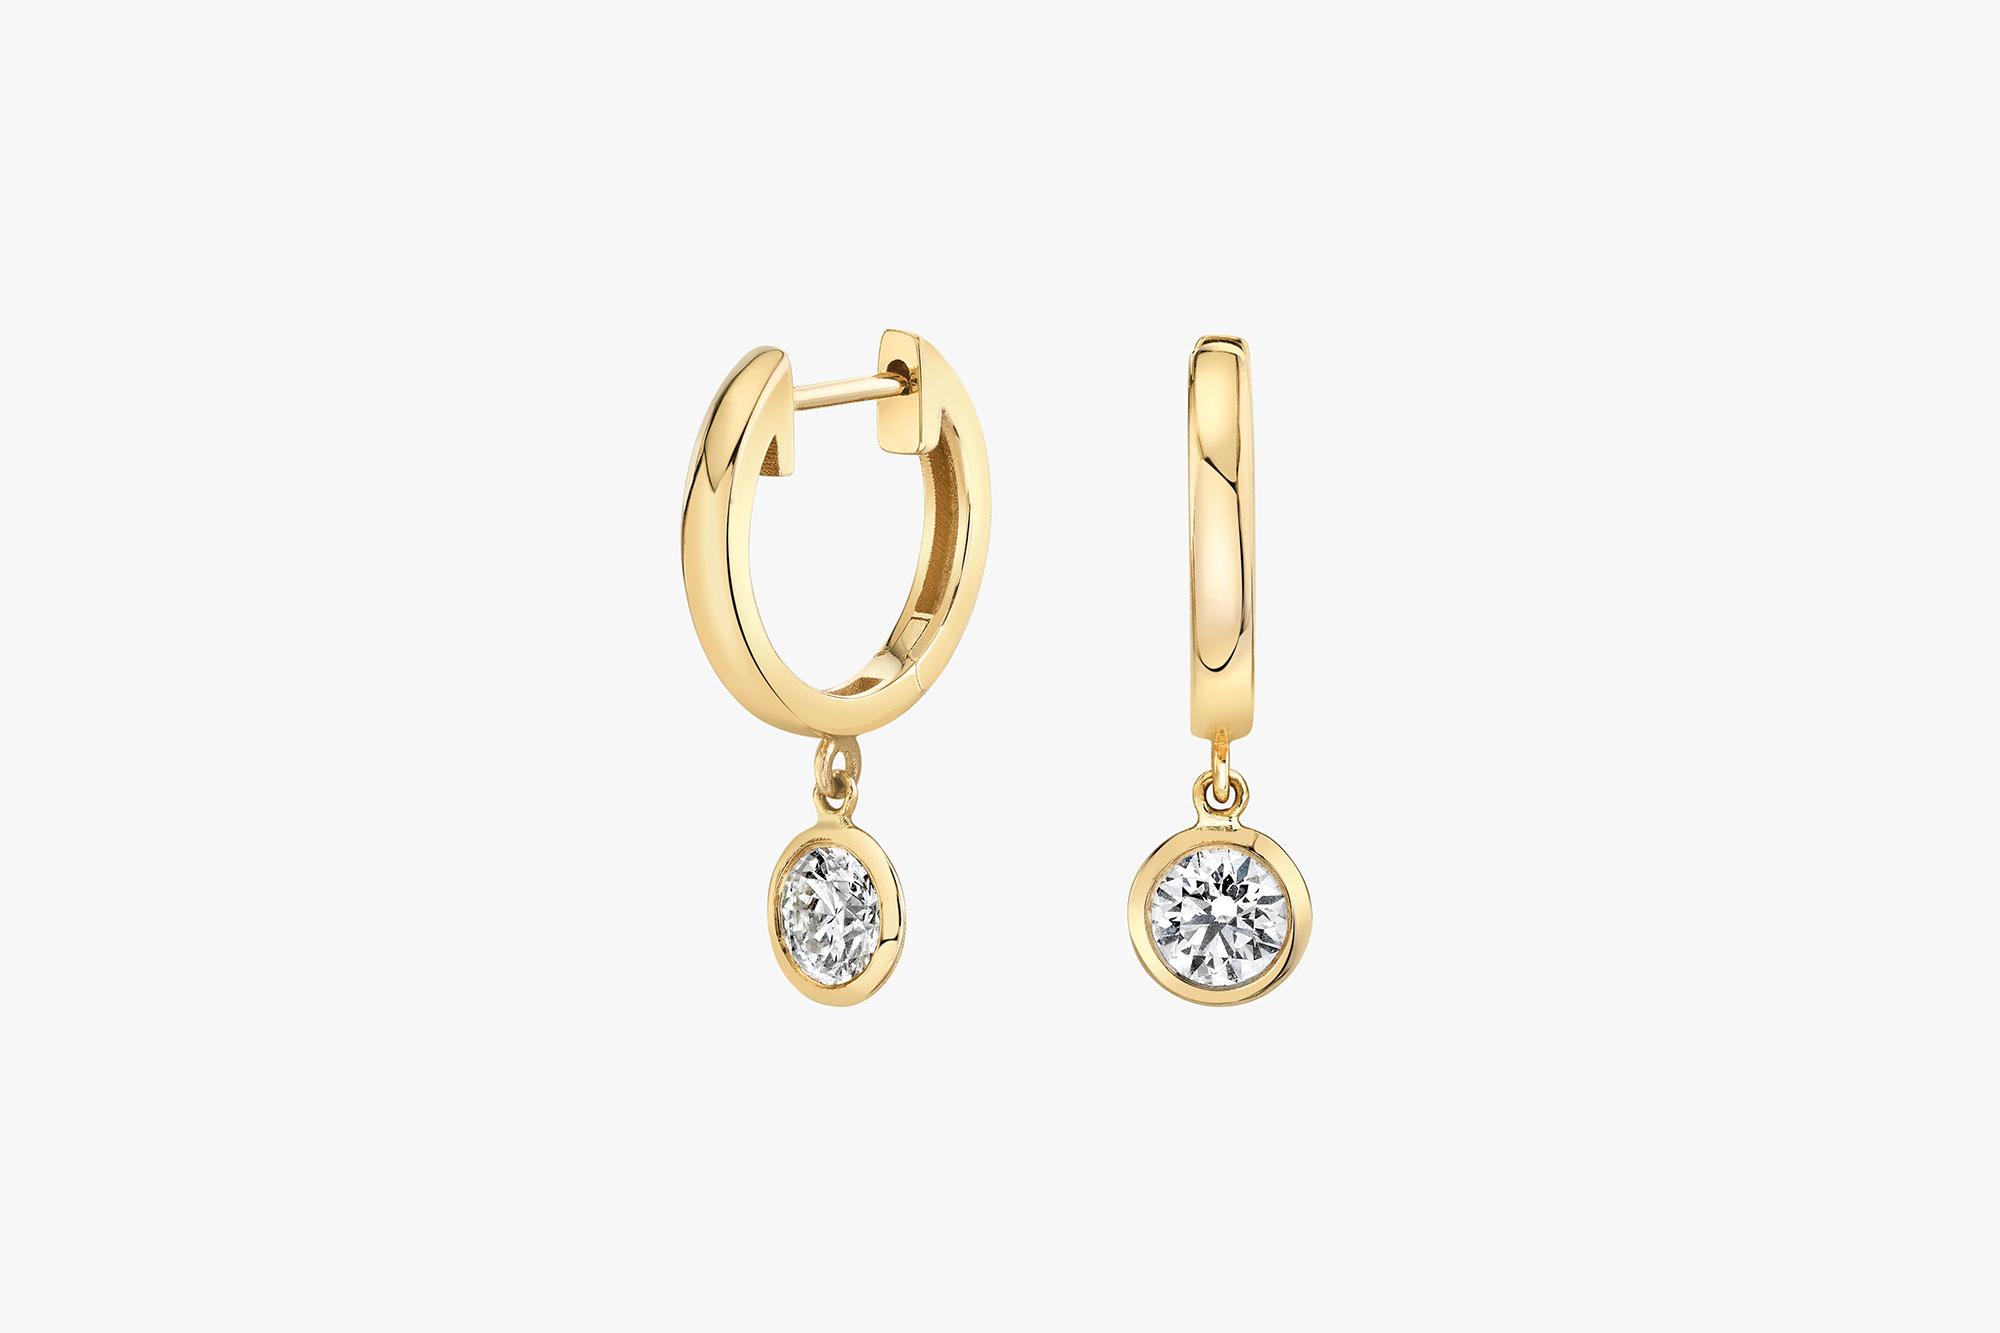 Round Brilliant, Lab-grown diamonds, yellow gold